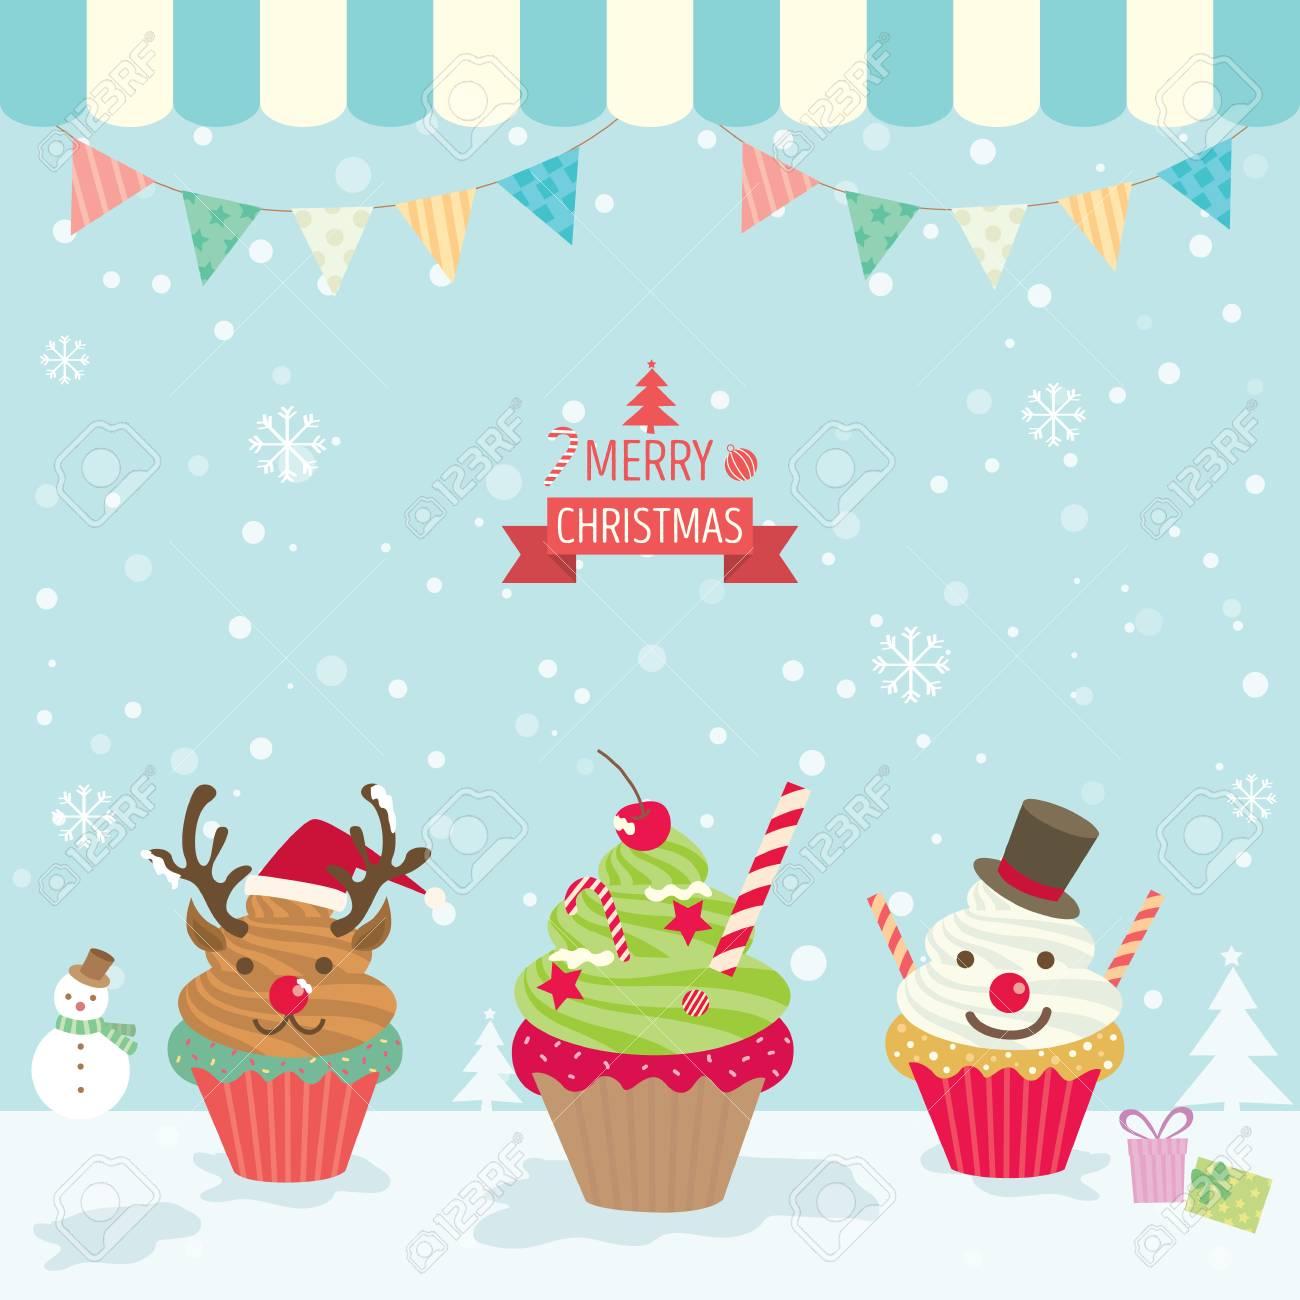 Illustration Vektor Merry Christmas Element Kleinen Kuchen Fur